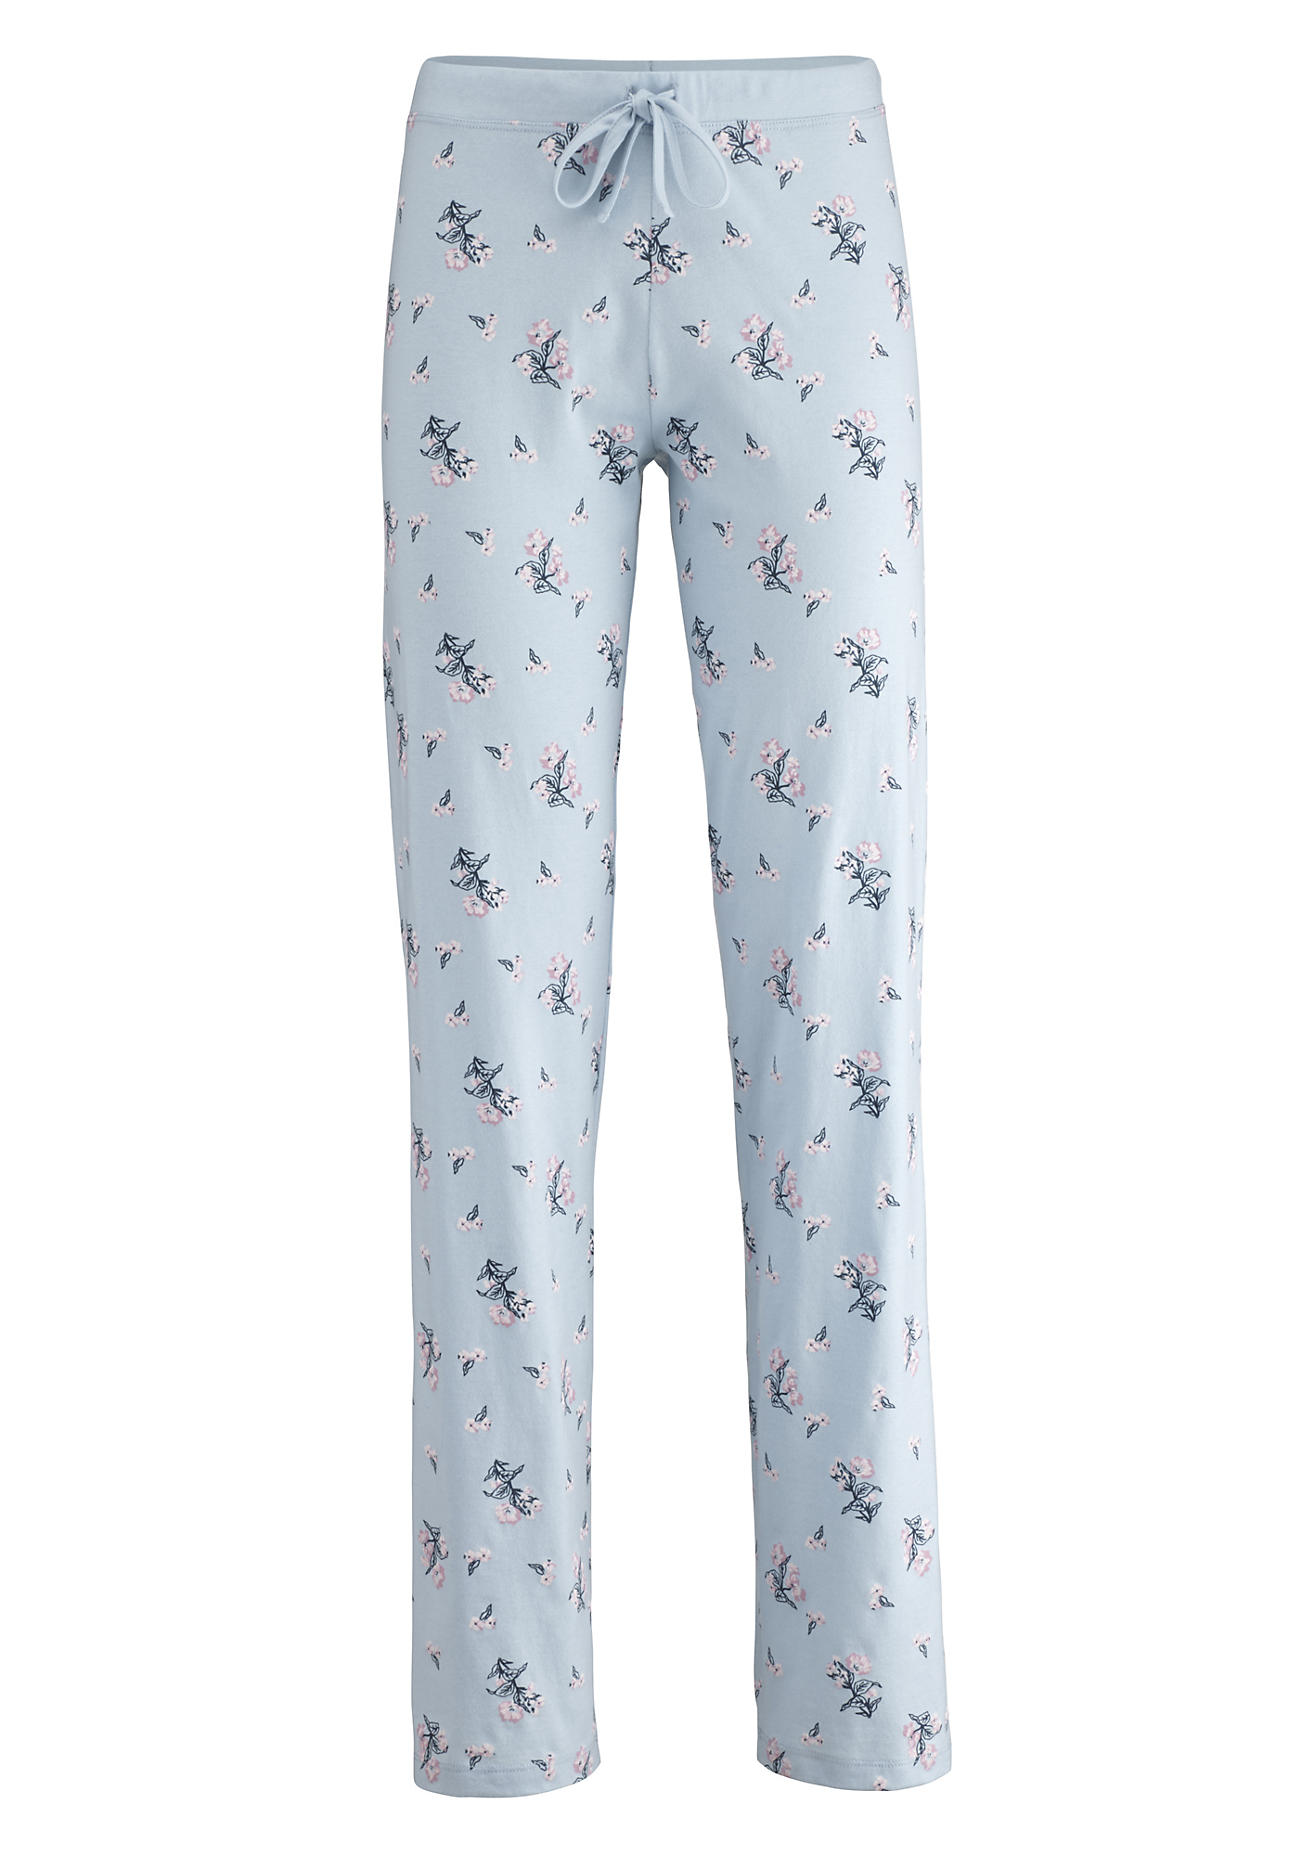 hessnatur Damen Damen Pyjamahose aus Bio-Baumwolle – blau – Größe 48